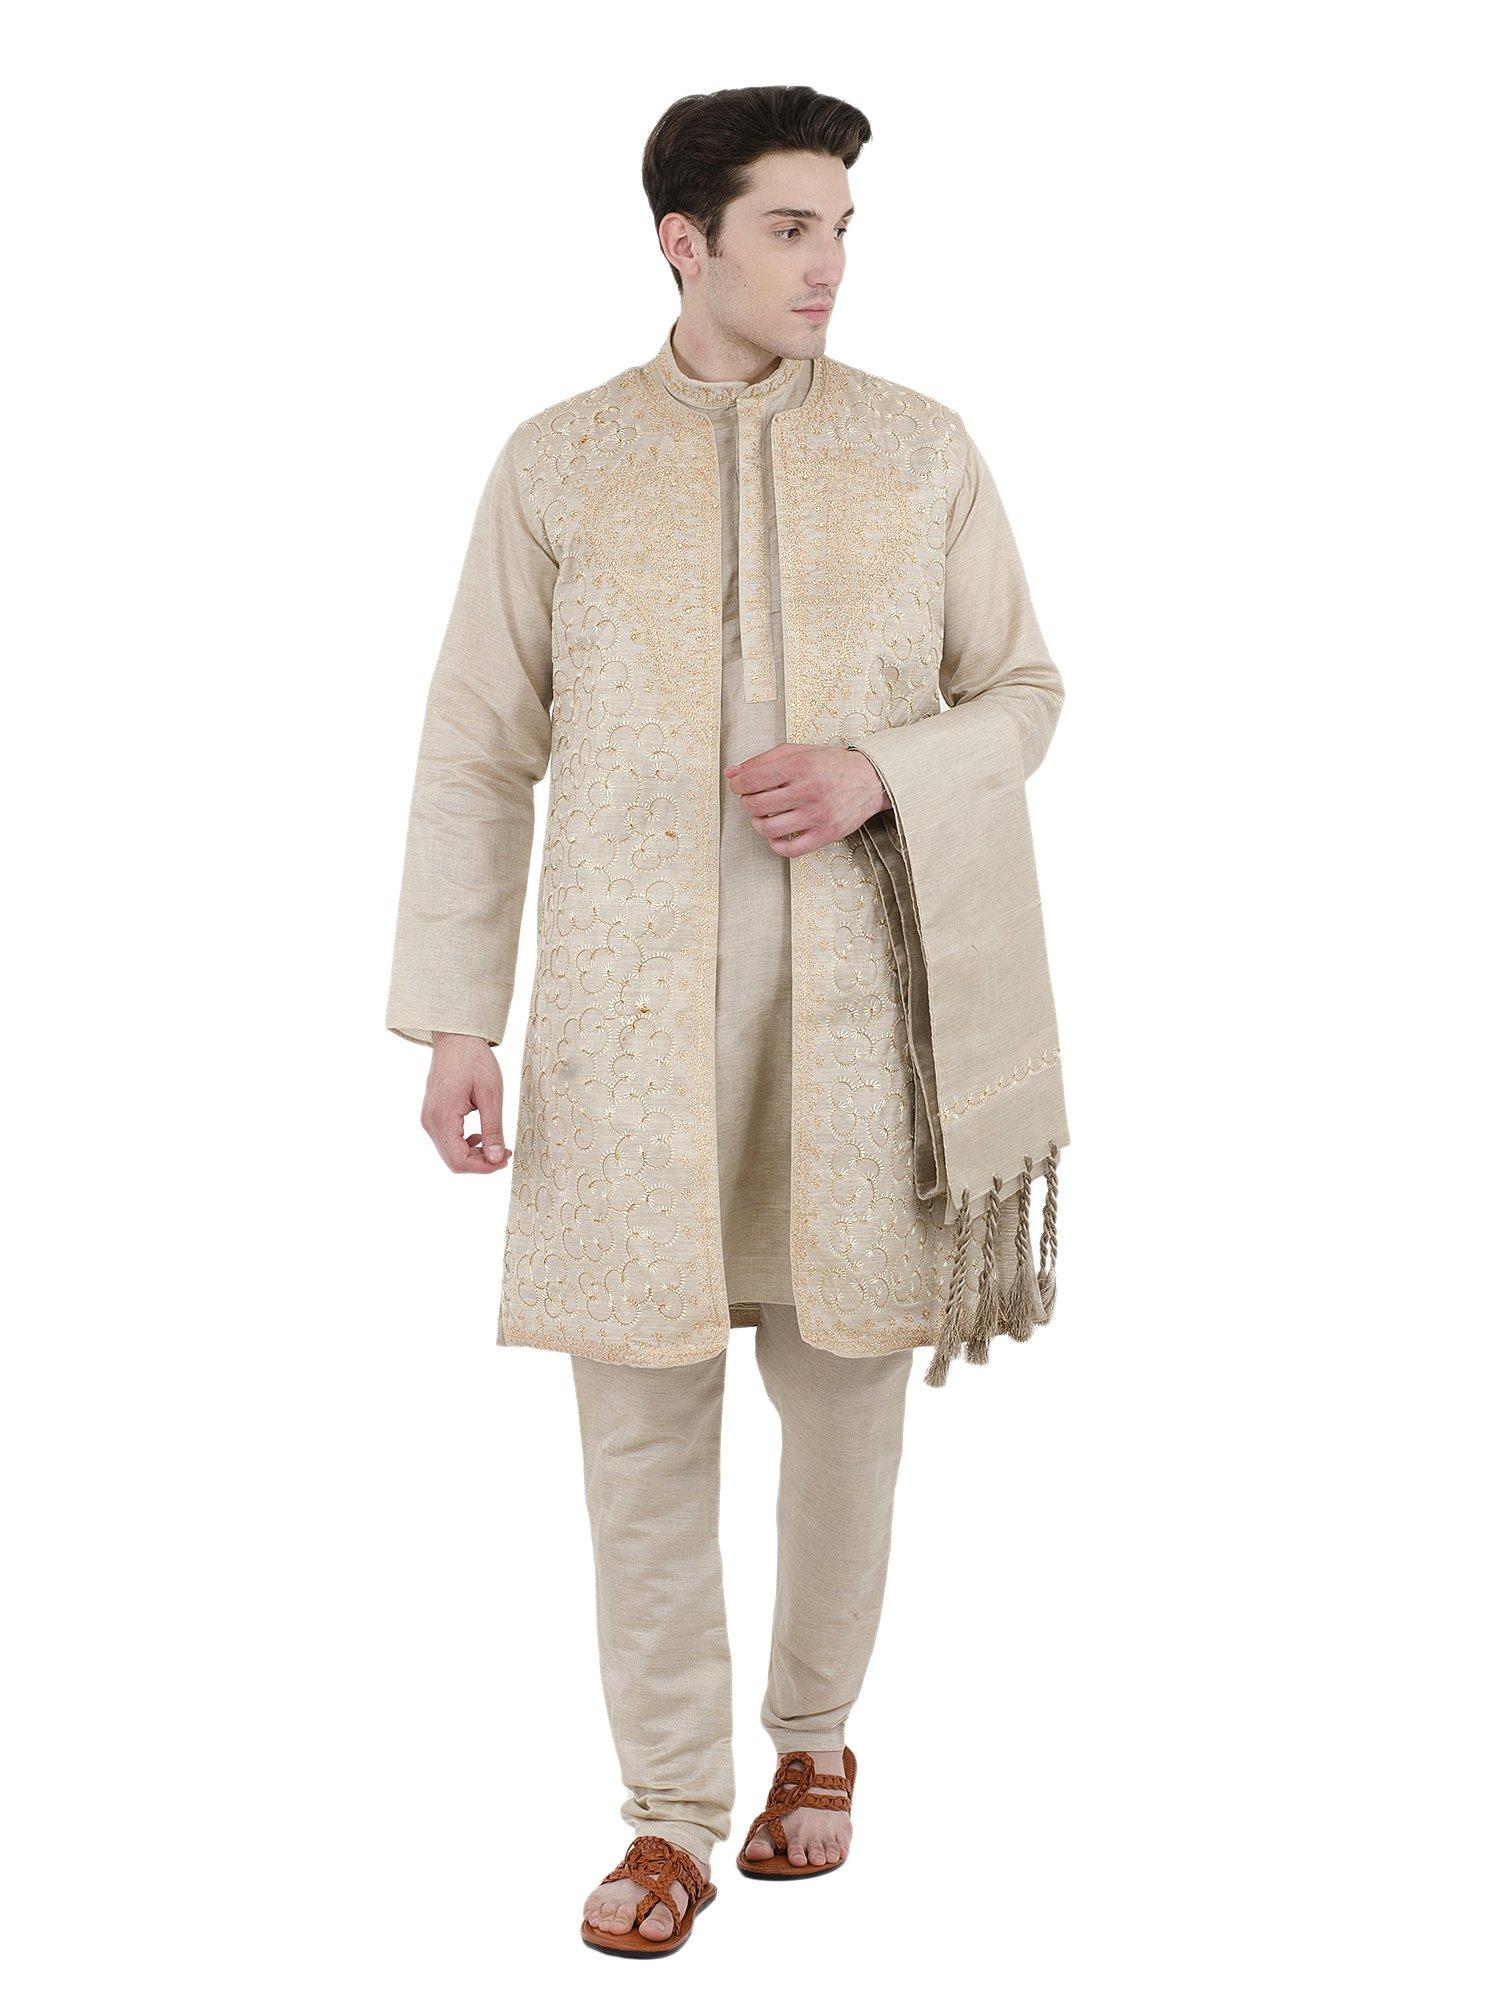 Traditional Kurta Pajama Kurta Pajama Sherwani Stole Mens 4-Pieces Set Ethnic Men Wear Wedding Dress -M